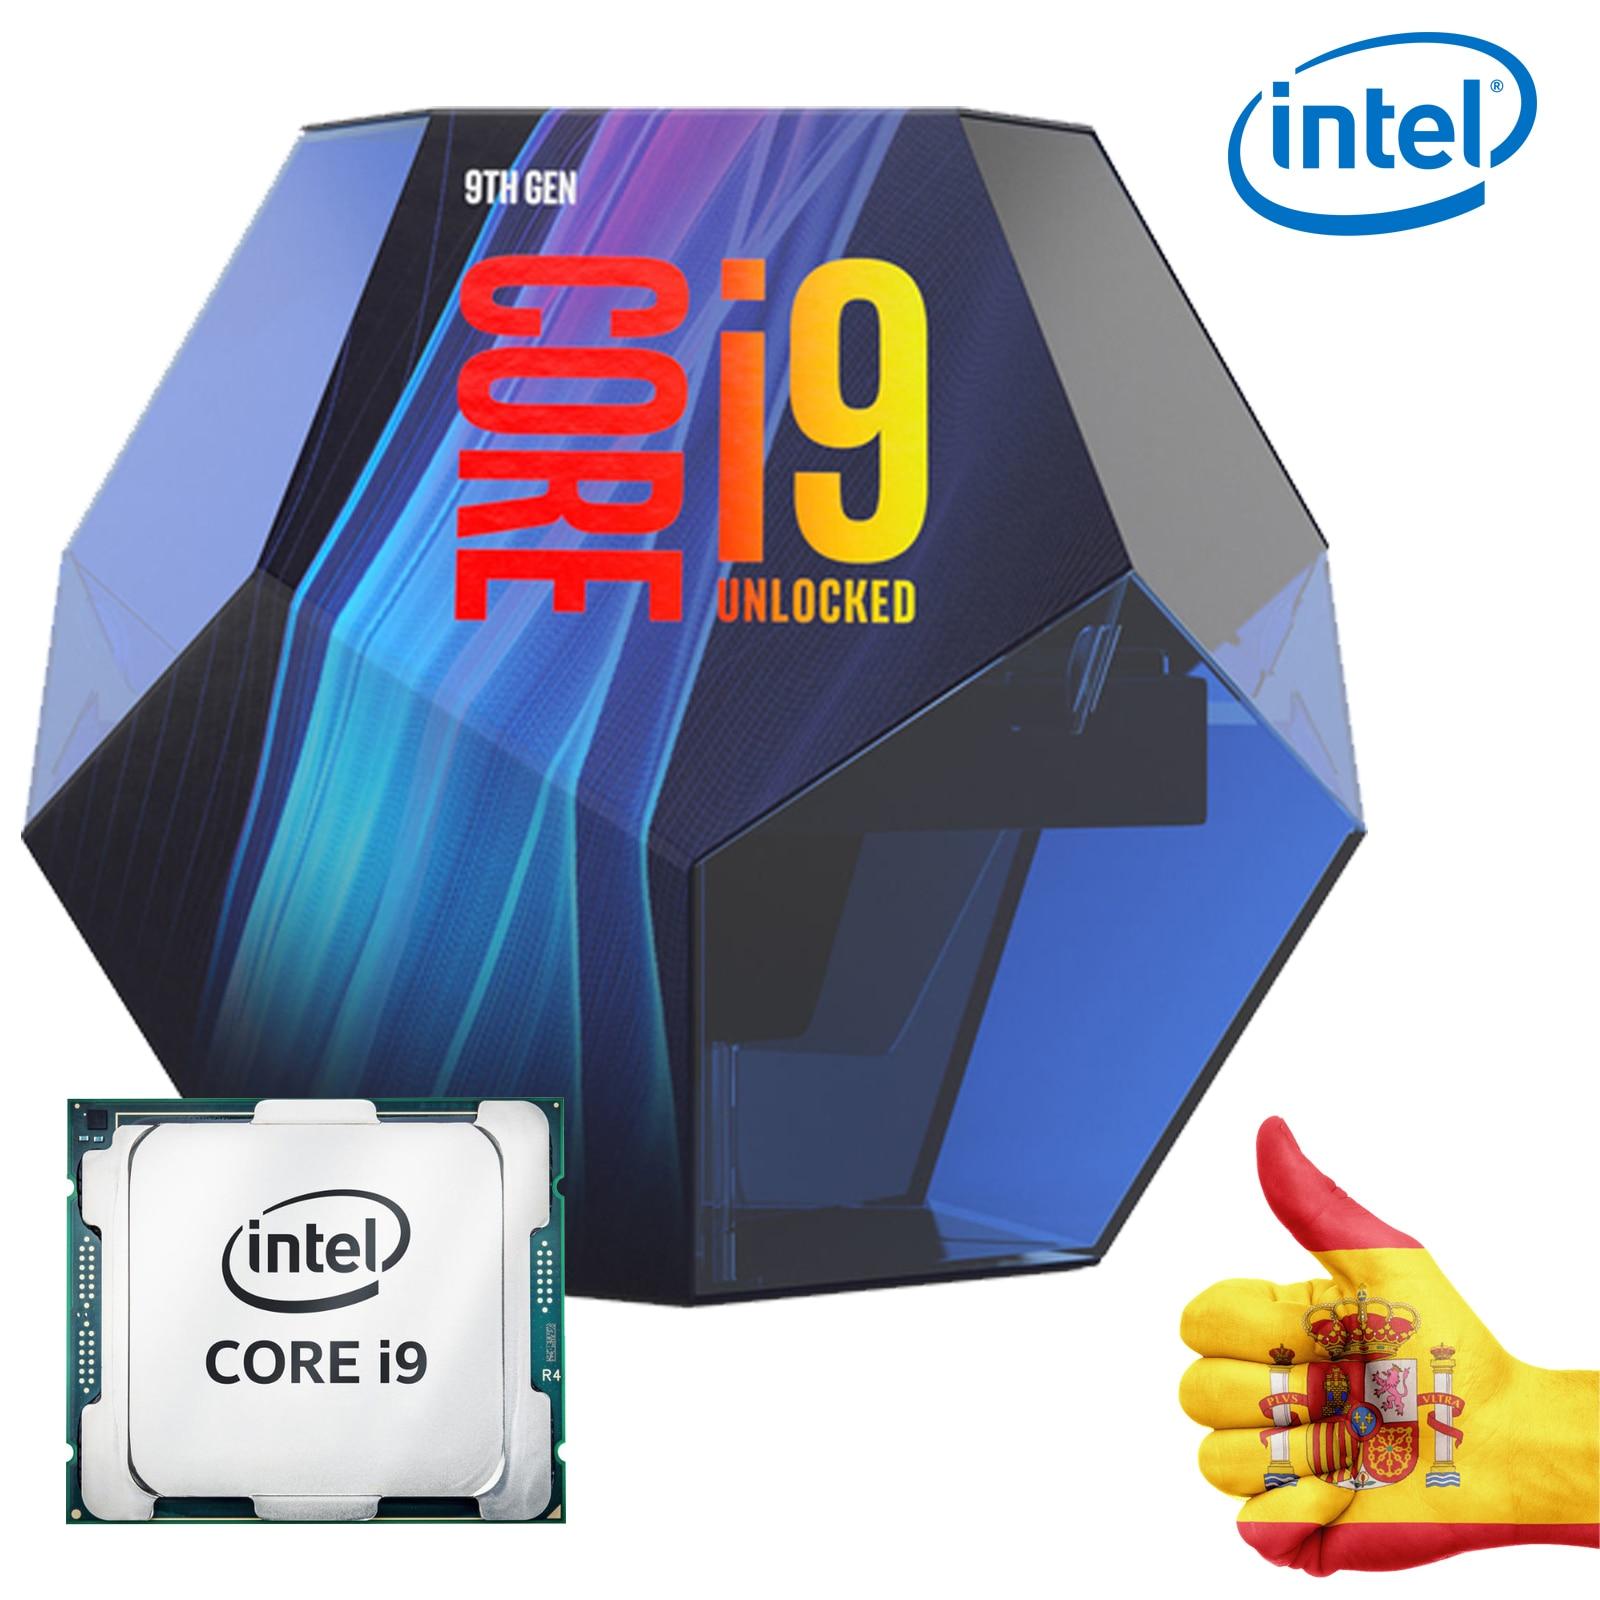 Intel Процессор CORE I9-9900K 3,60 ГГц 16M LGA1151 BX80684I99900K 999J2X 984503